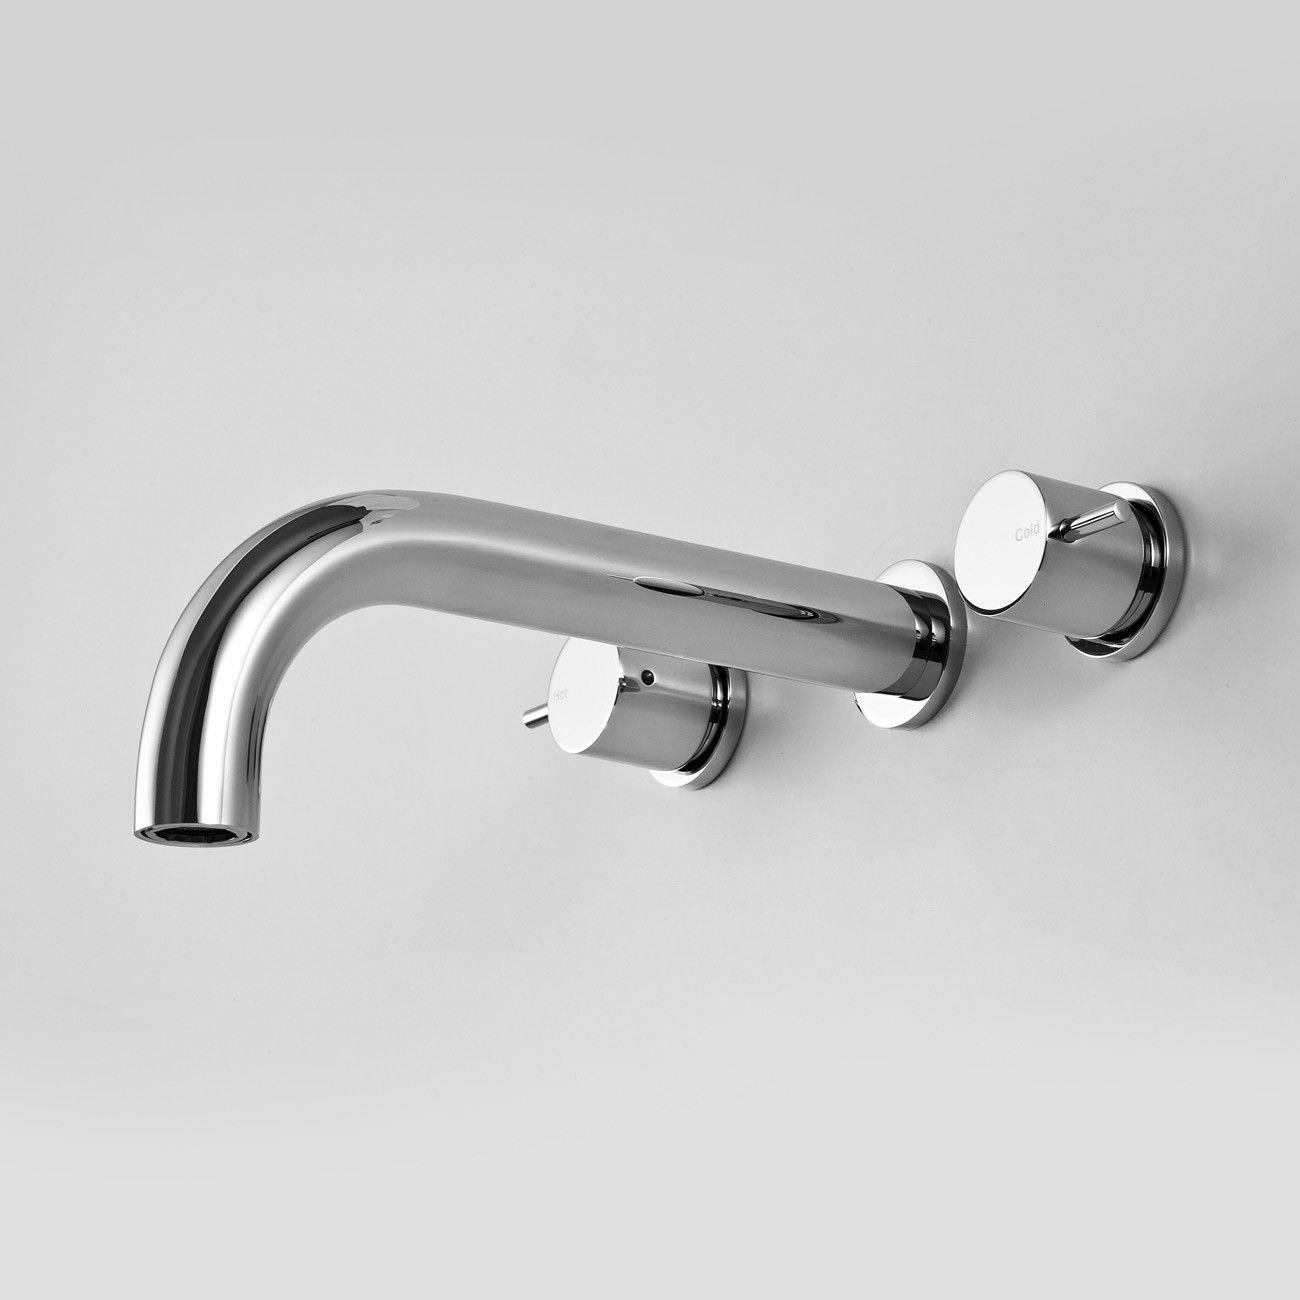 Rogerseller Logic Wall Bath Spout 230mm - Tap Sets - Rogerseller ...